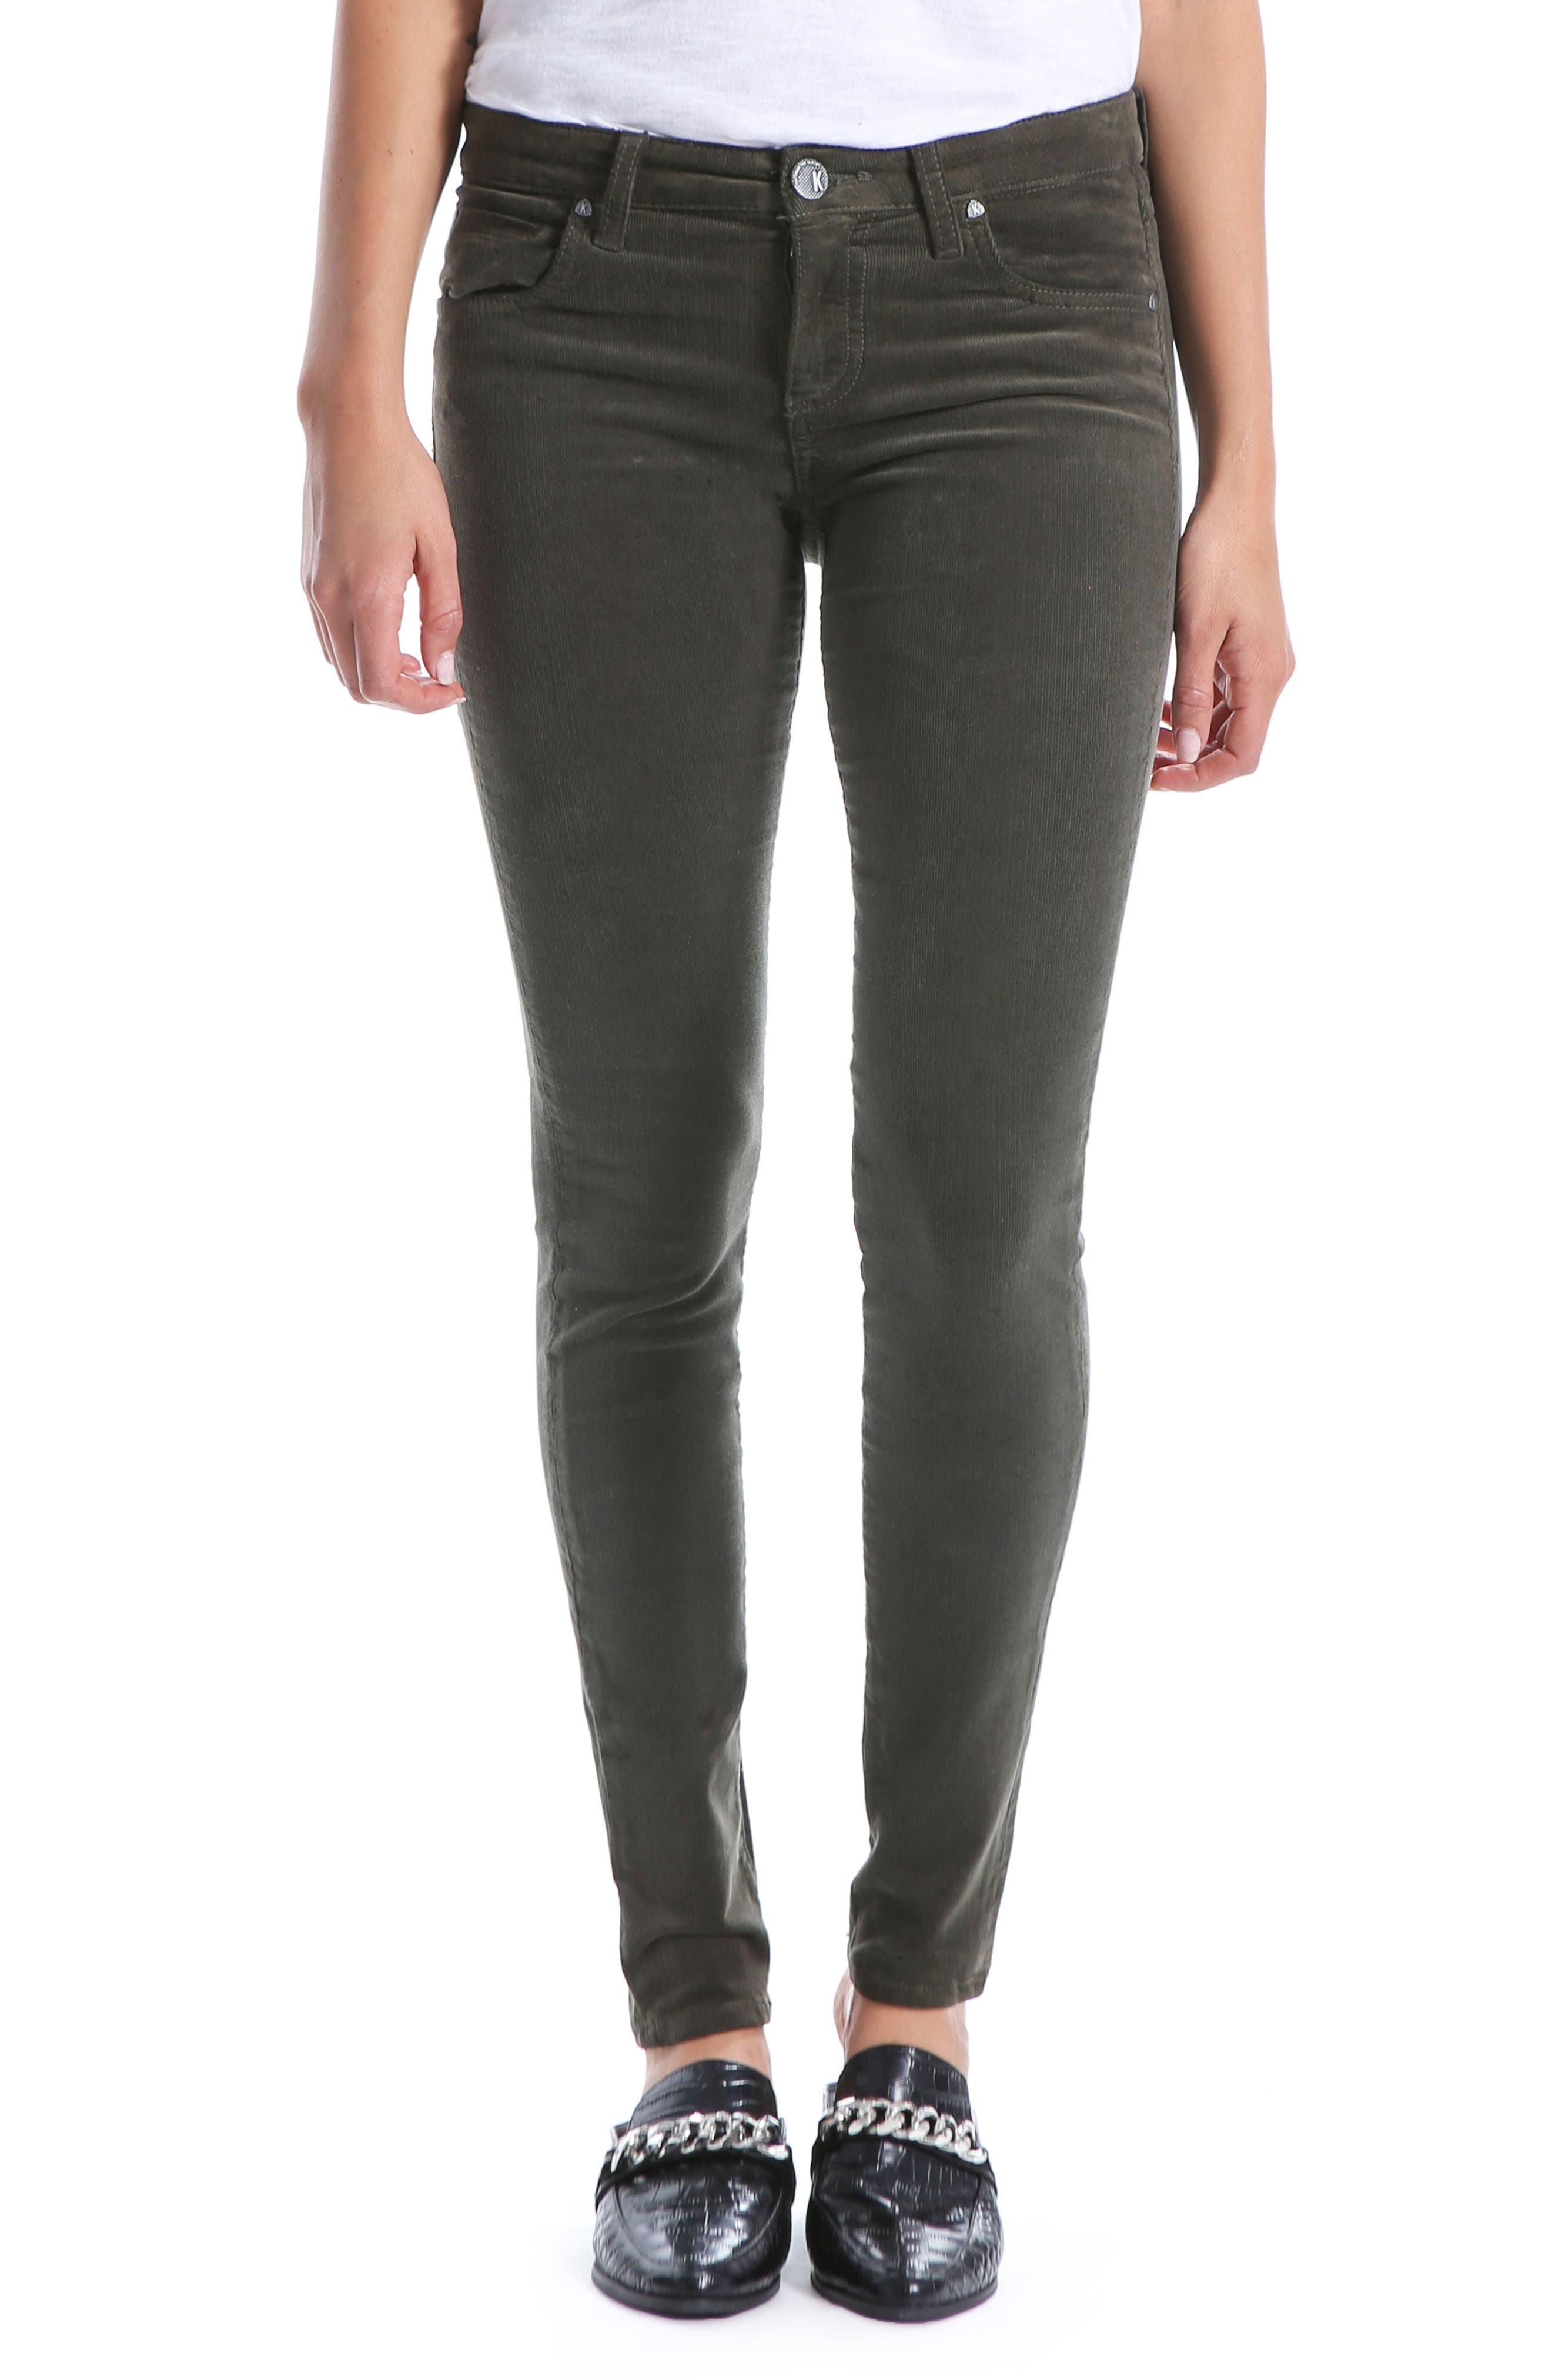 Womens Pants Leggings Nordstrom Natural Cotton Ultra Slim Overnight 4s